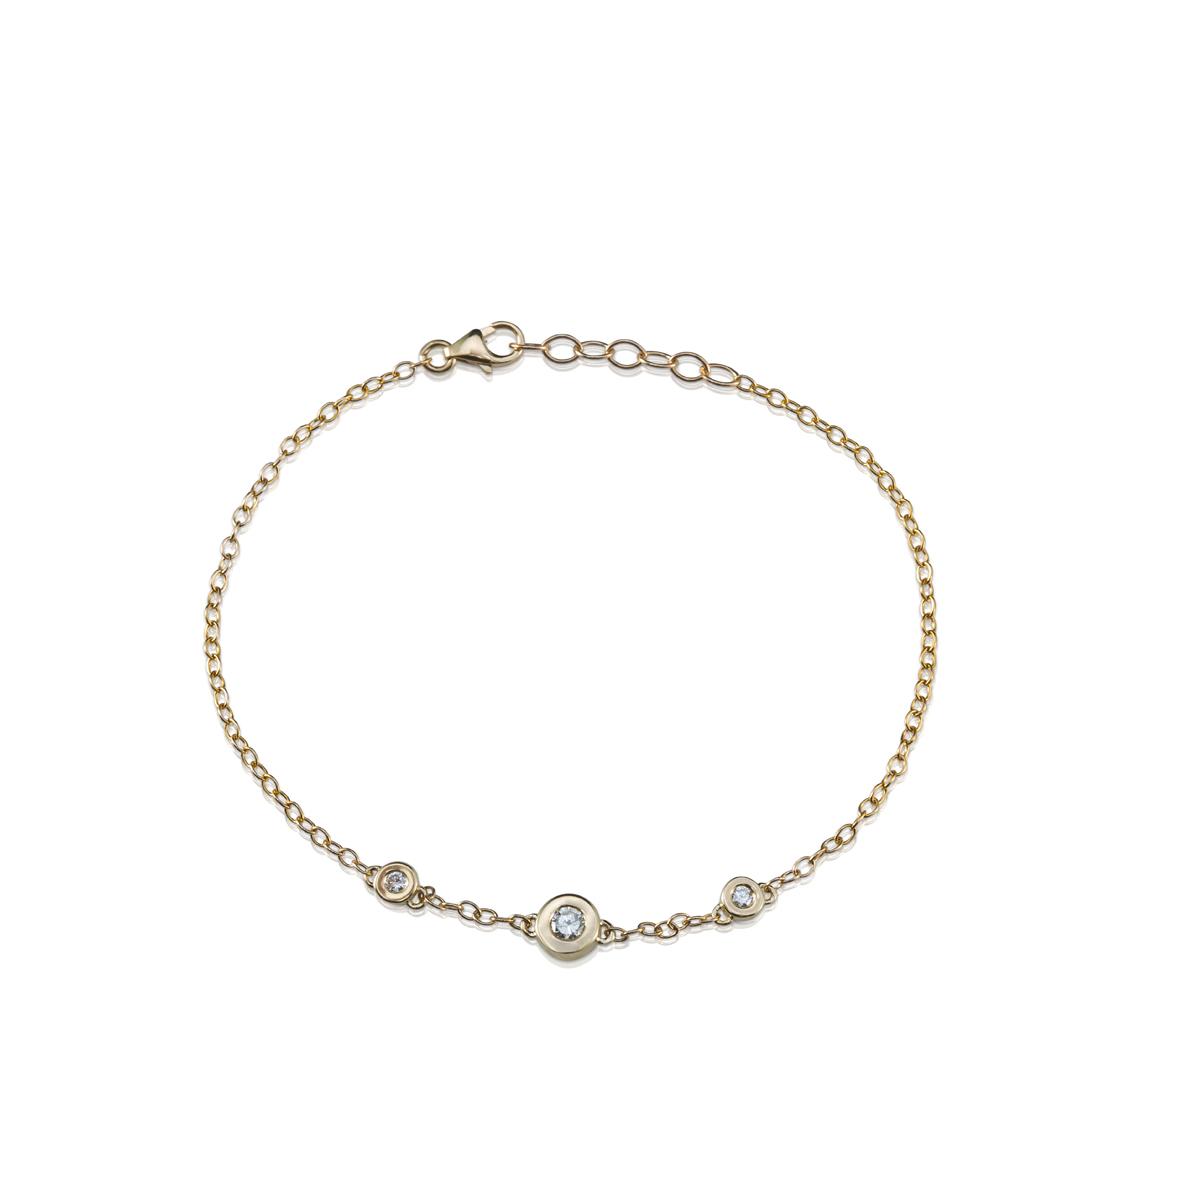 Gold 3 bezel set Diamonds bracelet